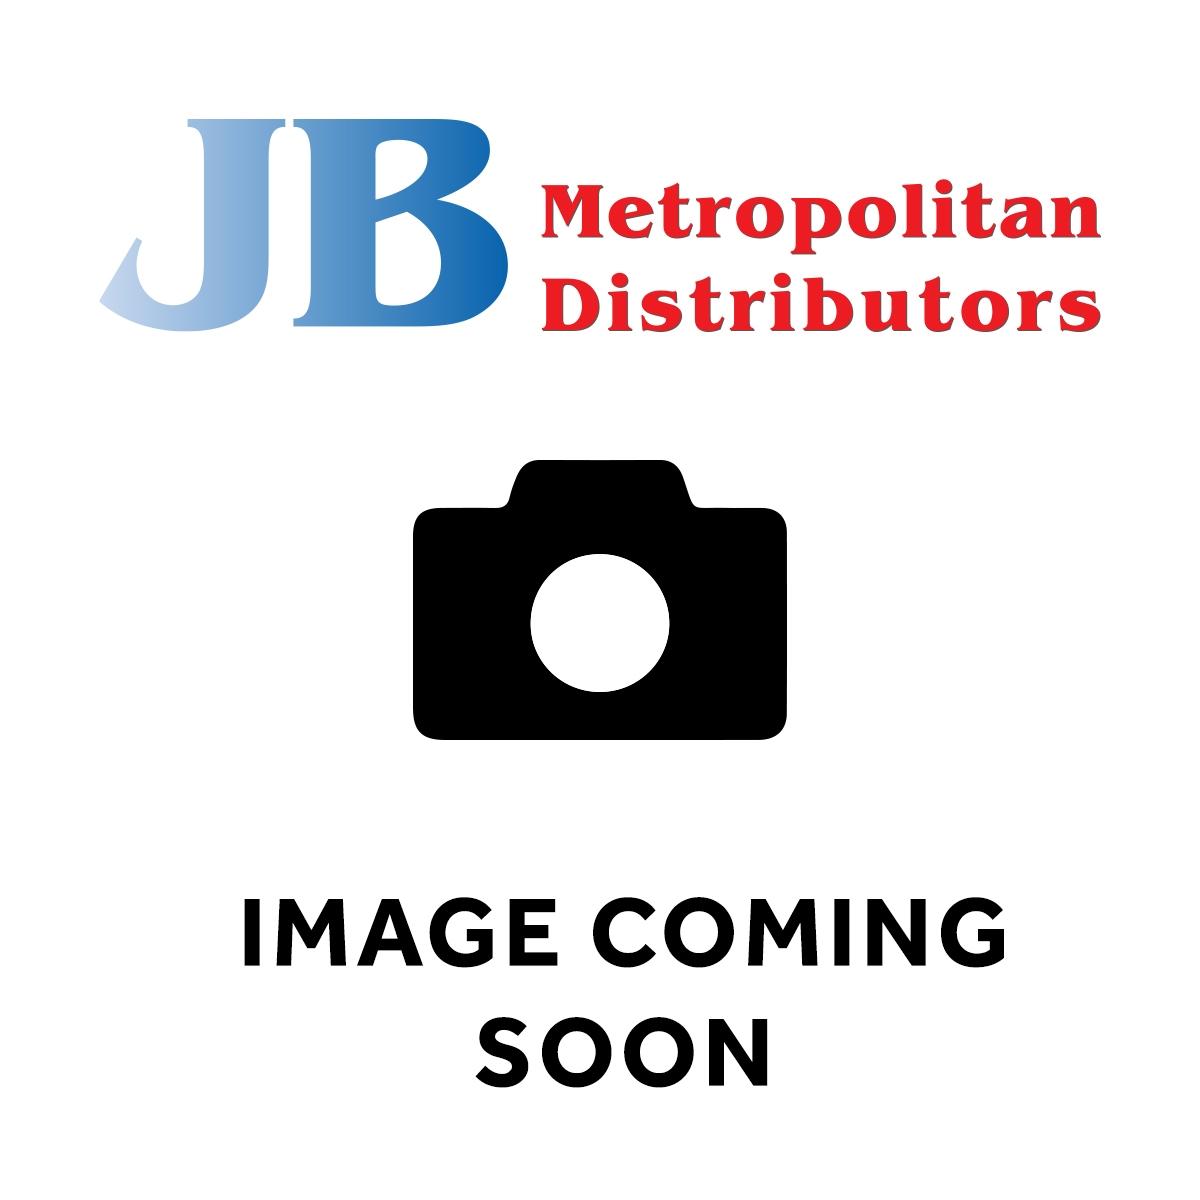 85G OCEAN SPRAY CRAISINS TRAIL CRANBERRY CHOCOLATE